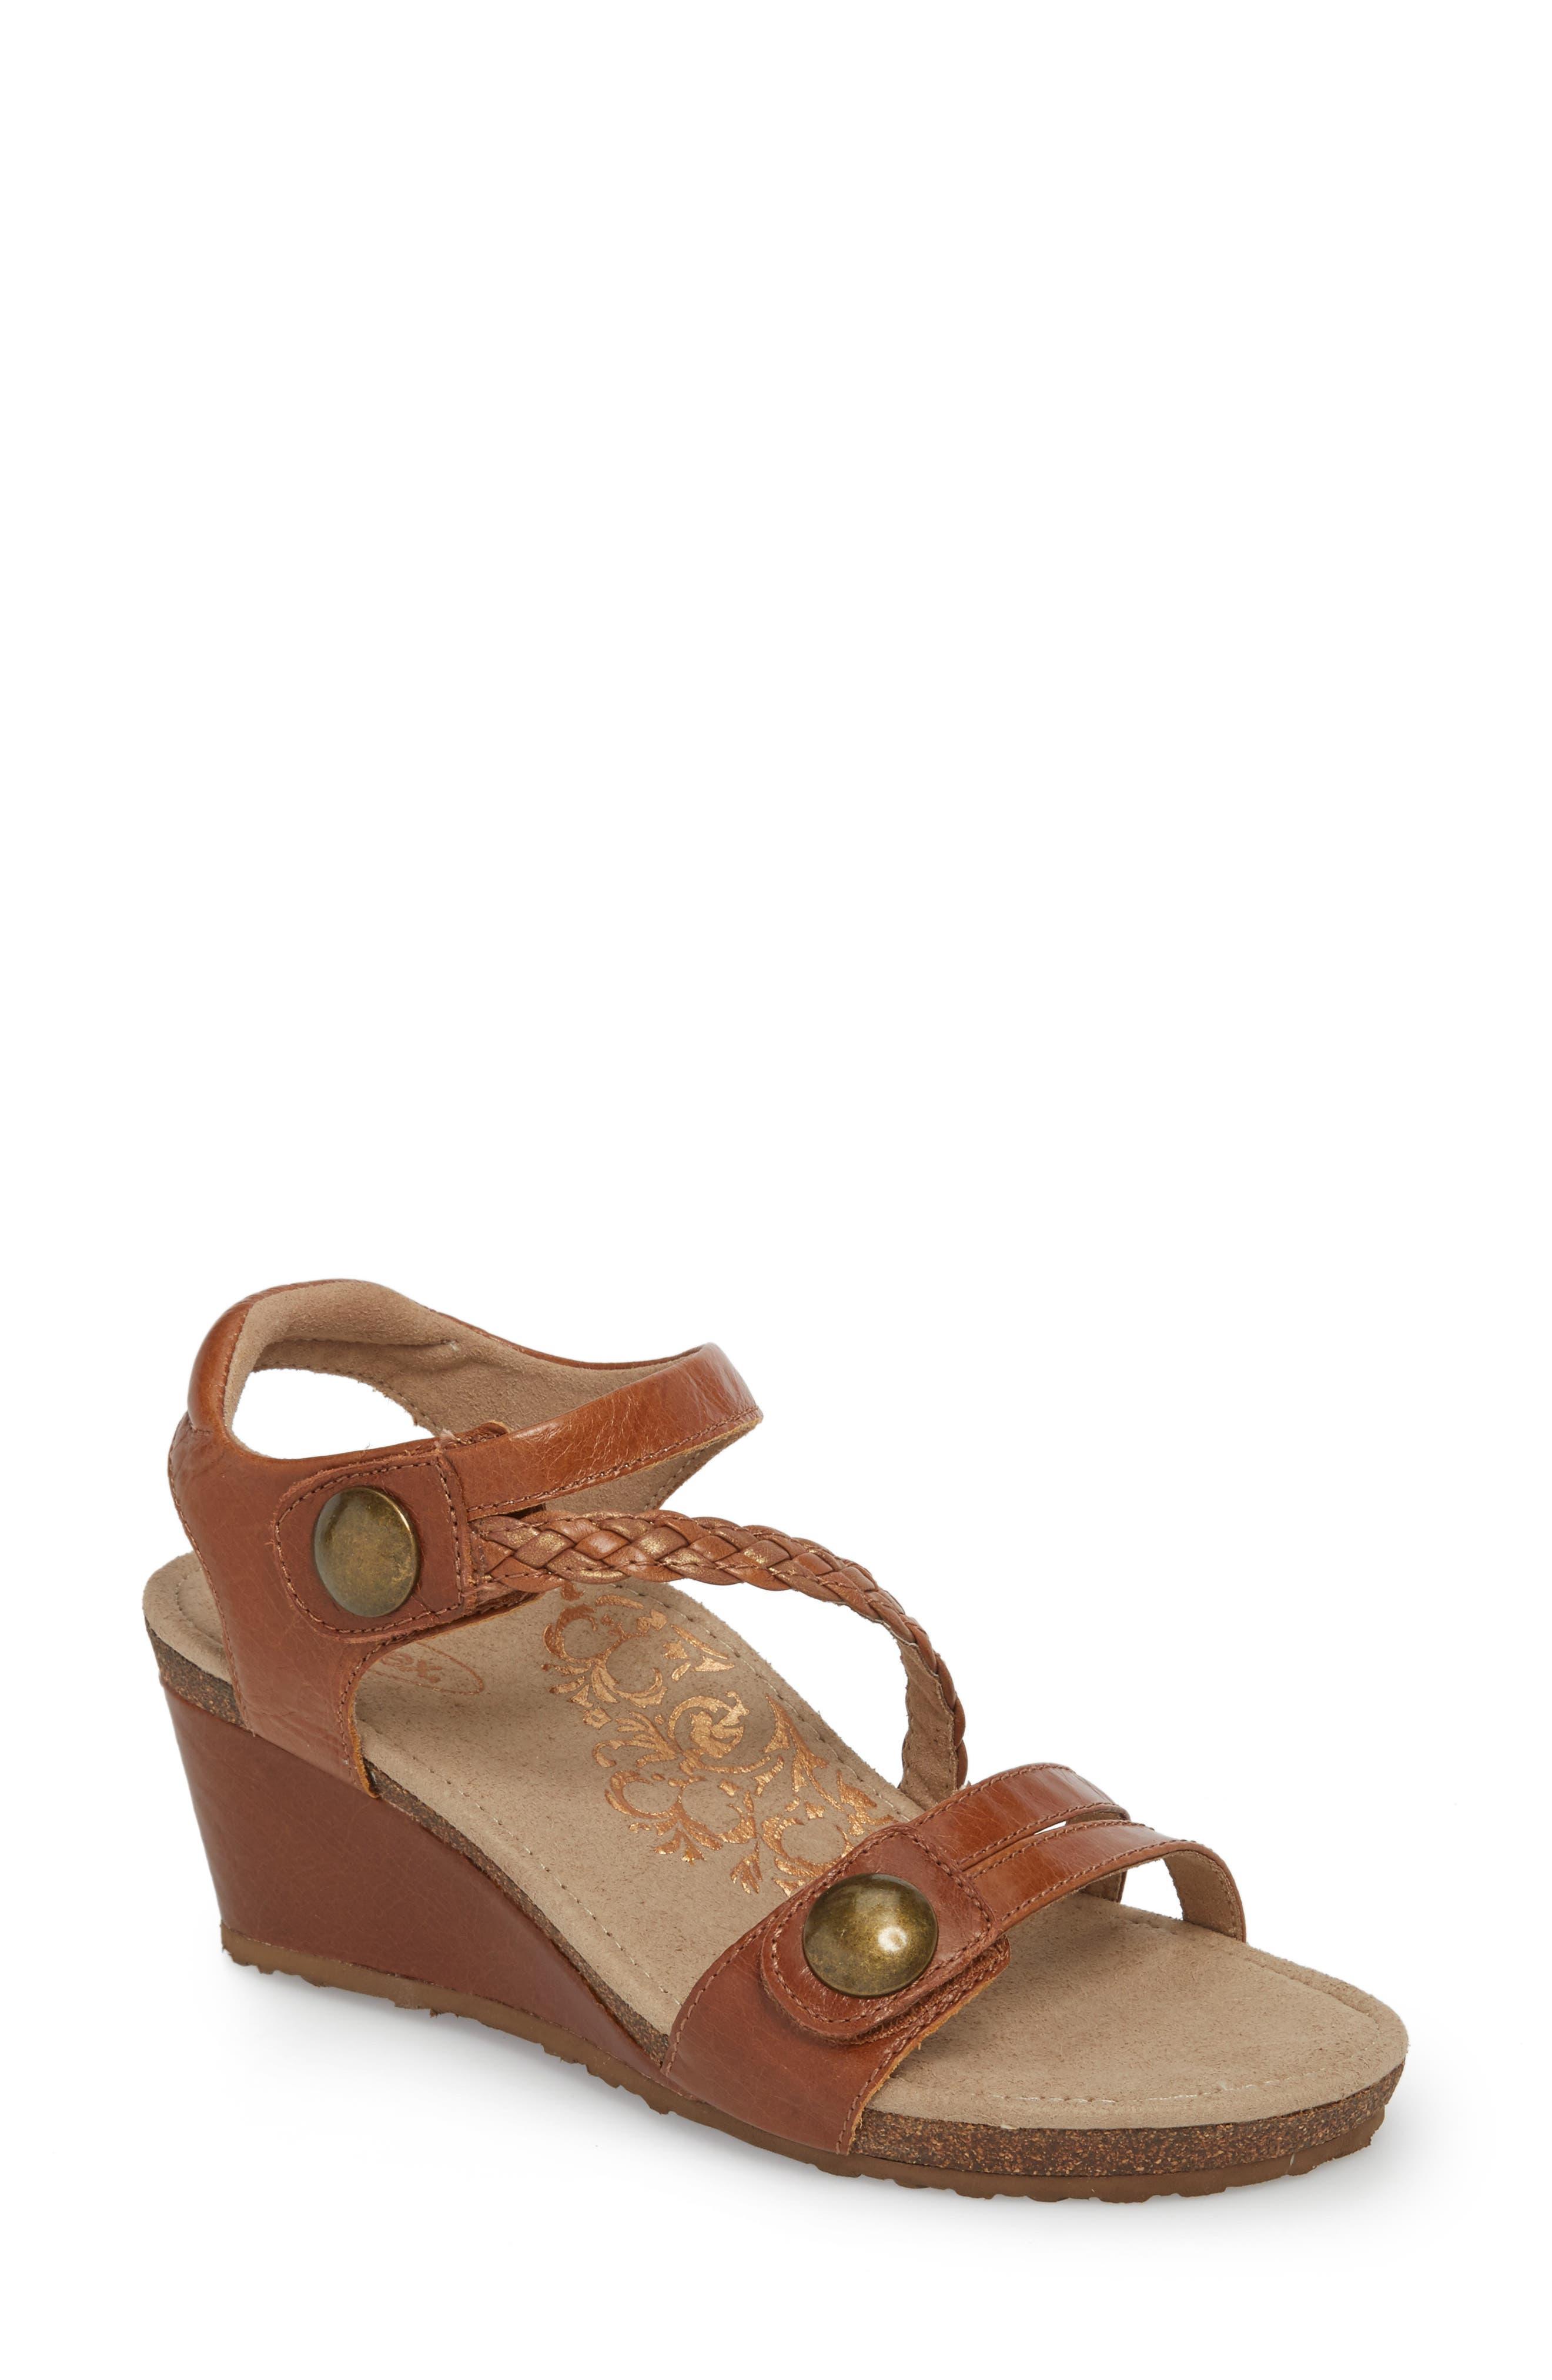 Aetrex 'Naya' Wedge Sandal ...